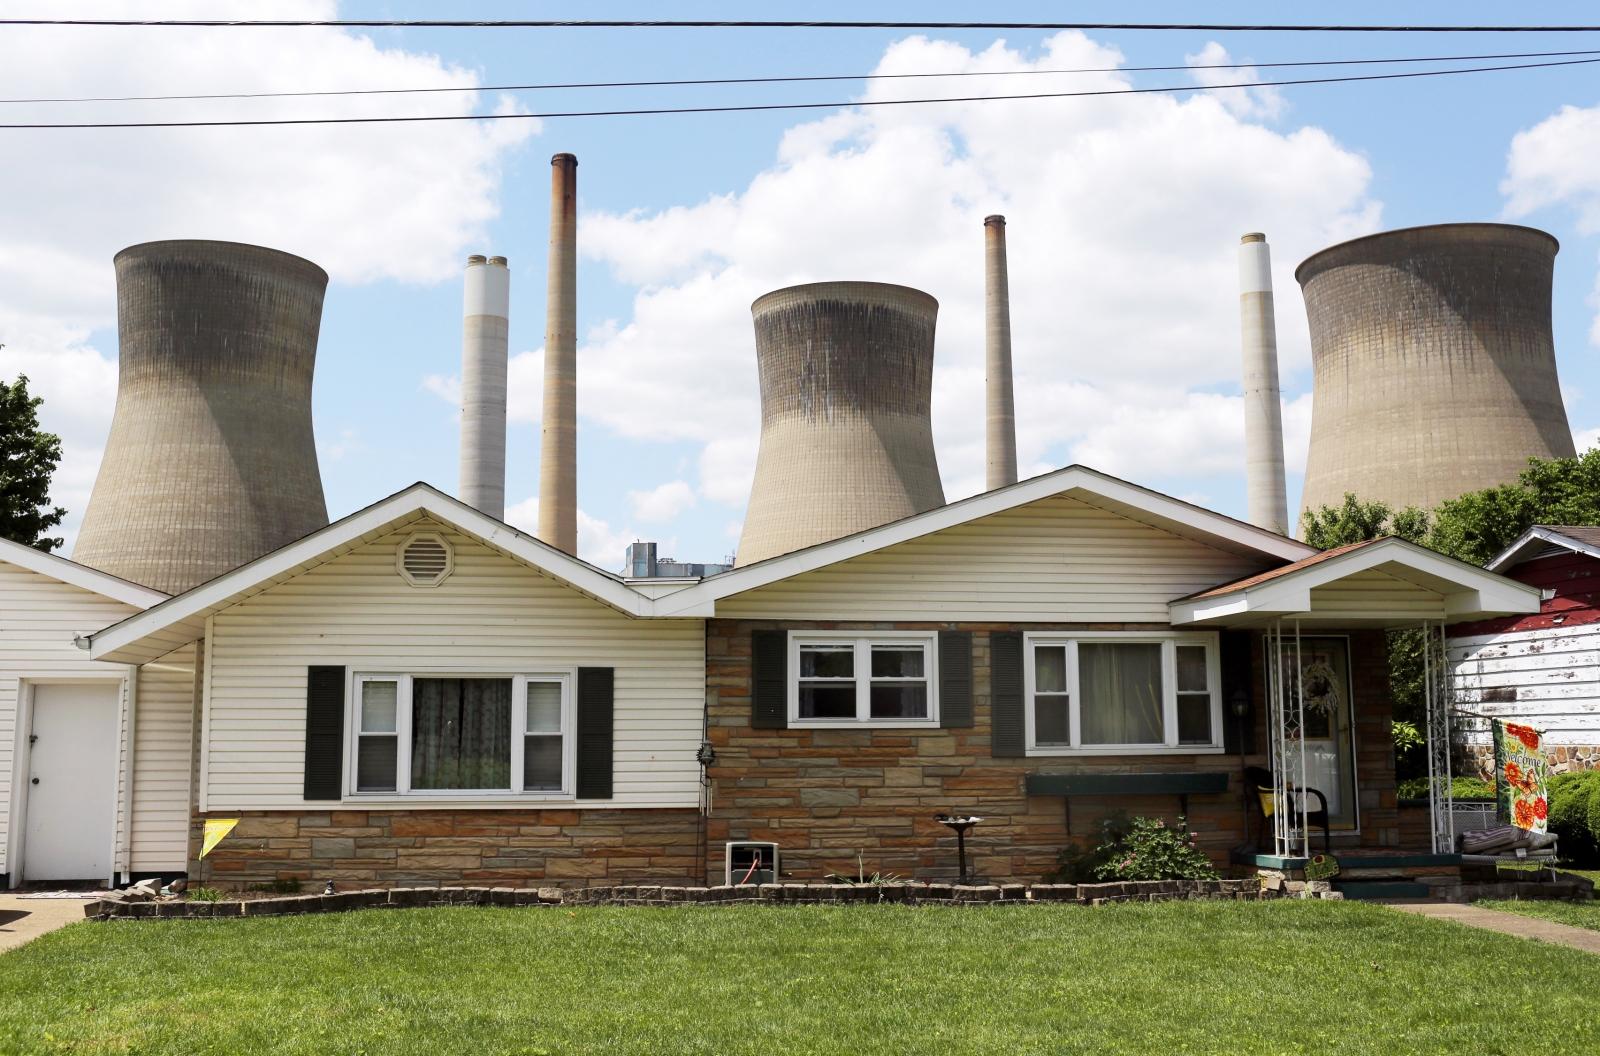 Coal plant seen behind West Virginia home